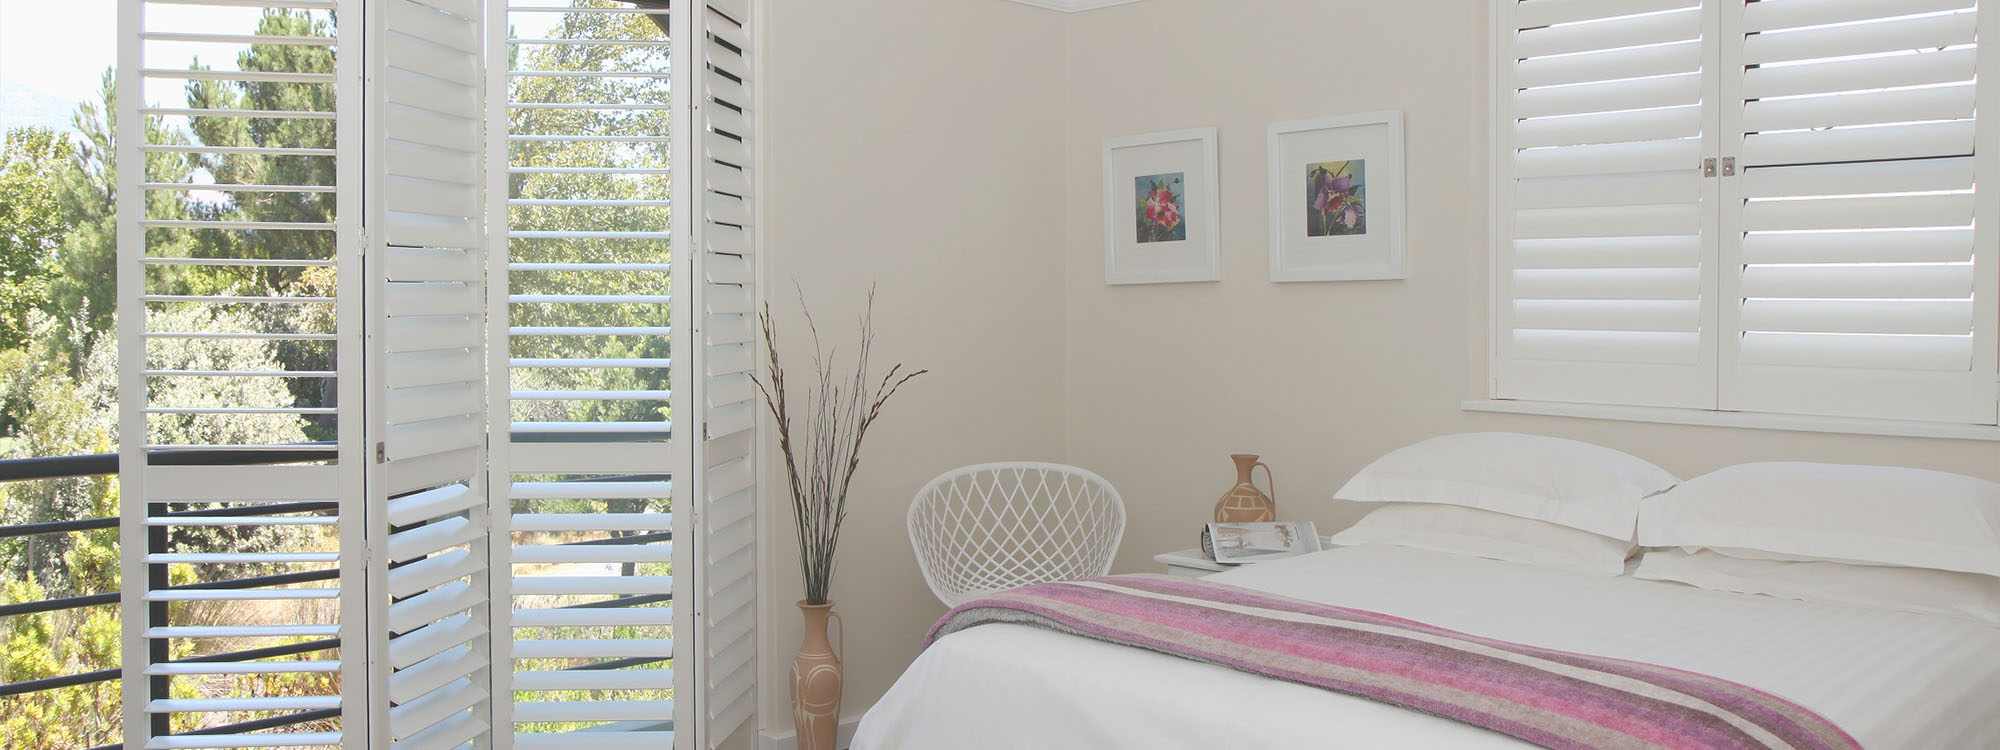 Decowood-shutters-Bedroom-silk-white-